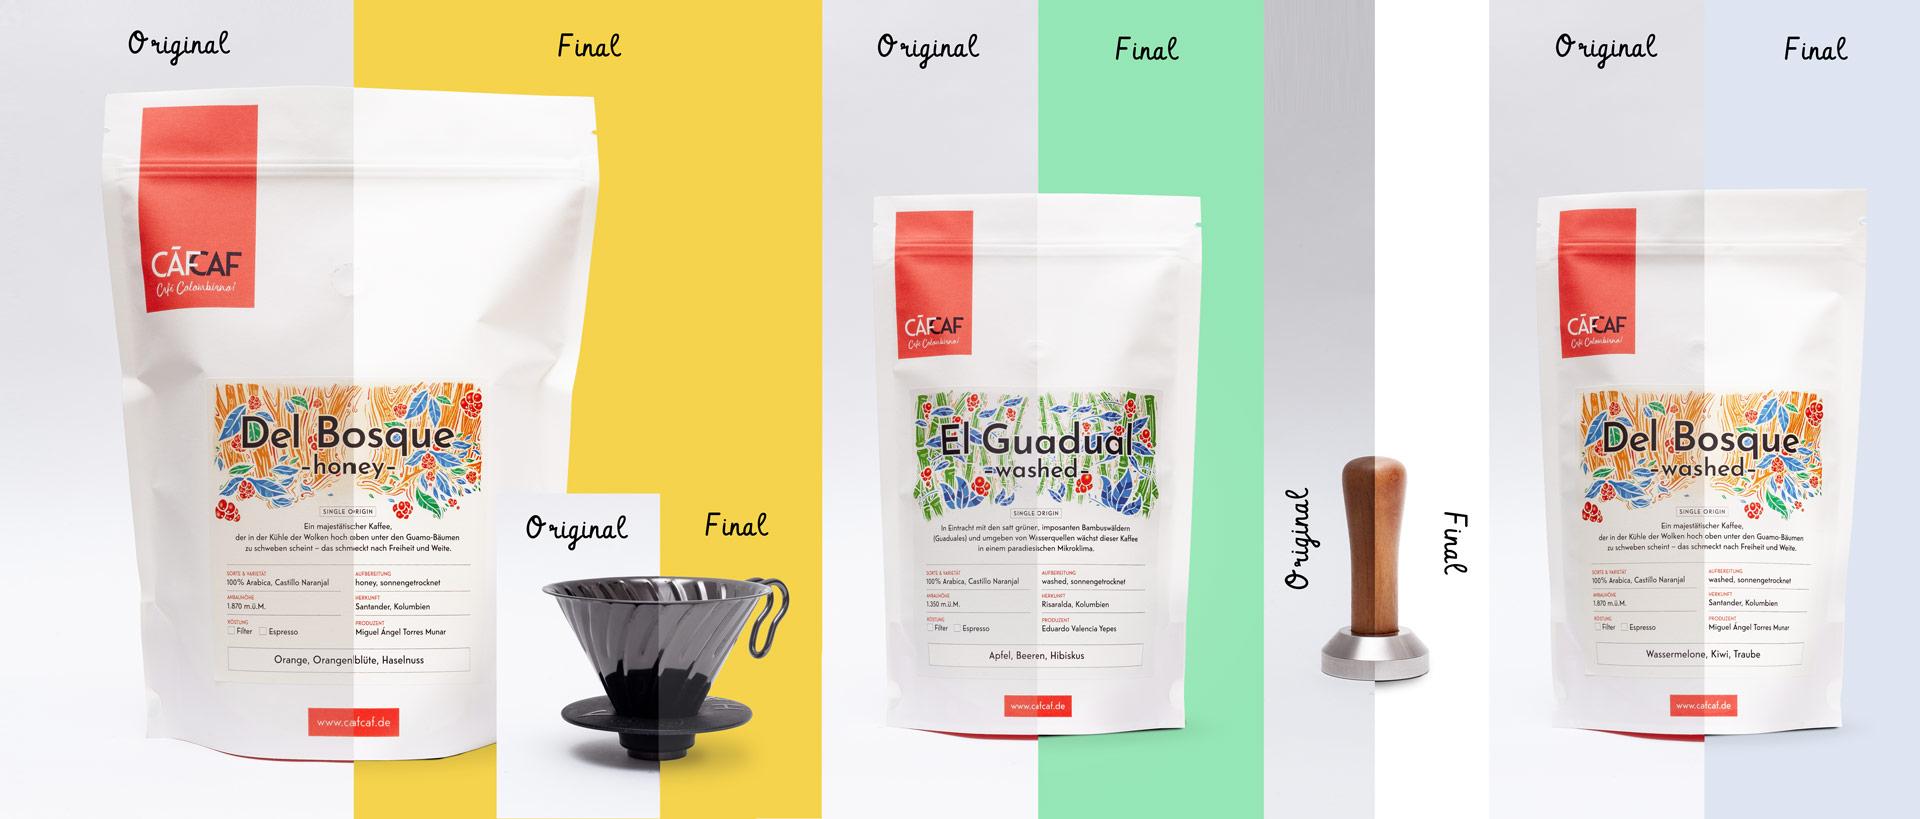 CafCaf Kaffeeshop und Blog, Woocommerce Webshop & WordPress System